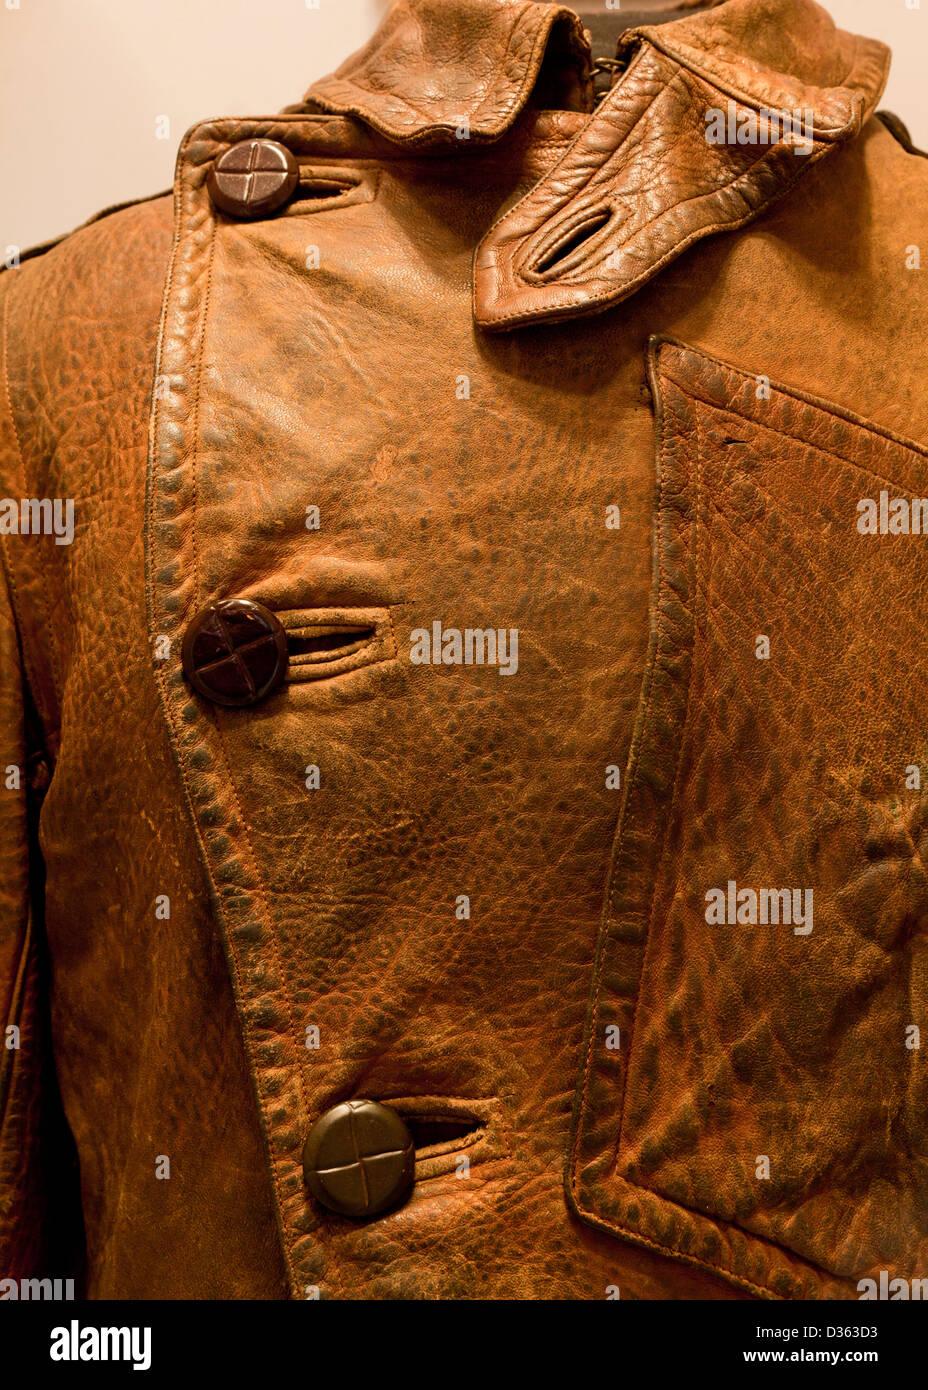 Vintage leather jacket - Stock Image